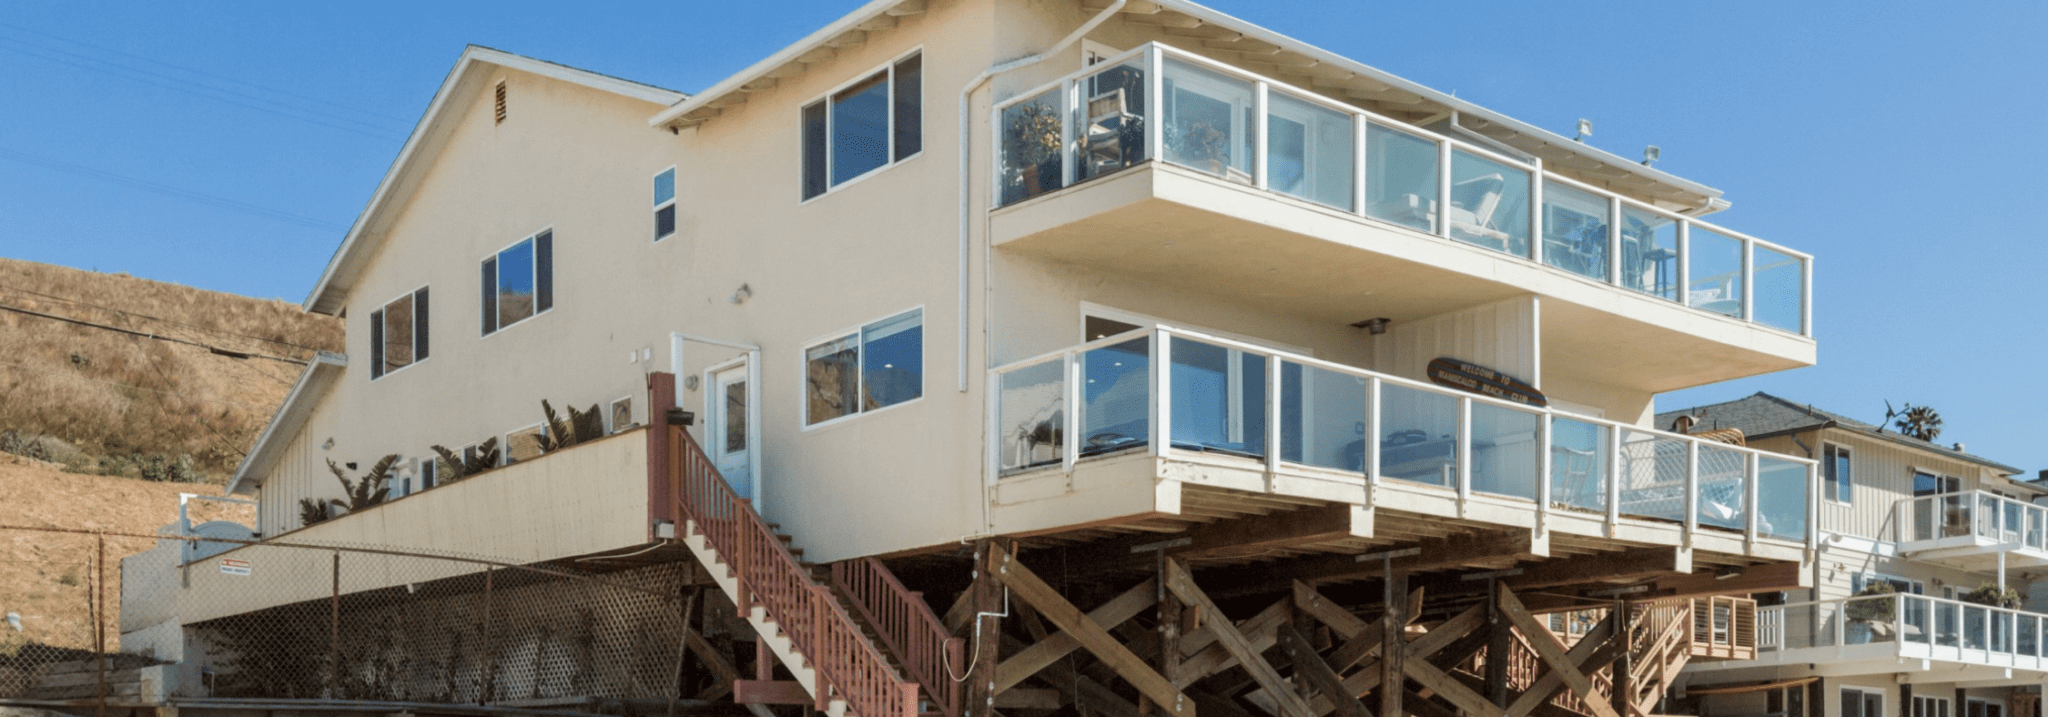 beachfront house LA Airbnb risen